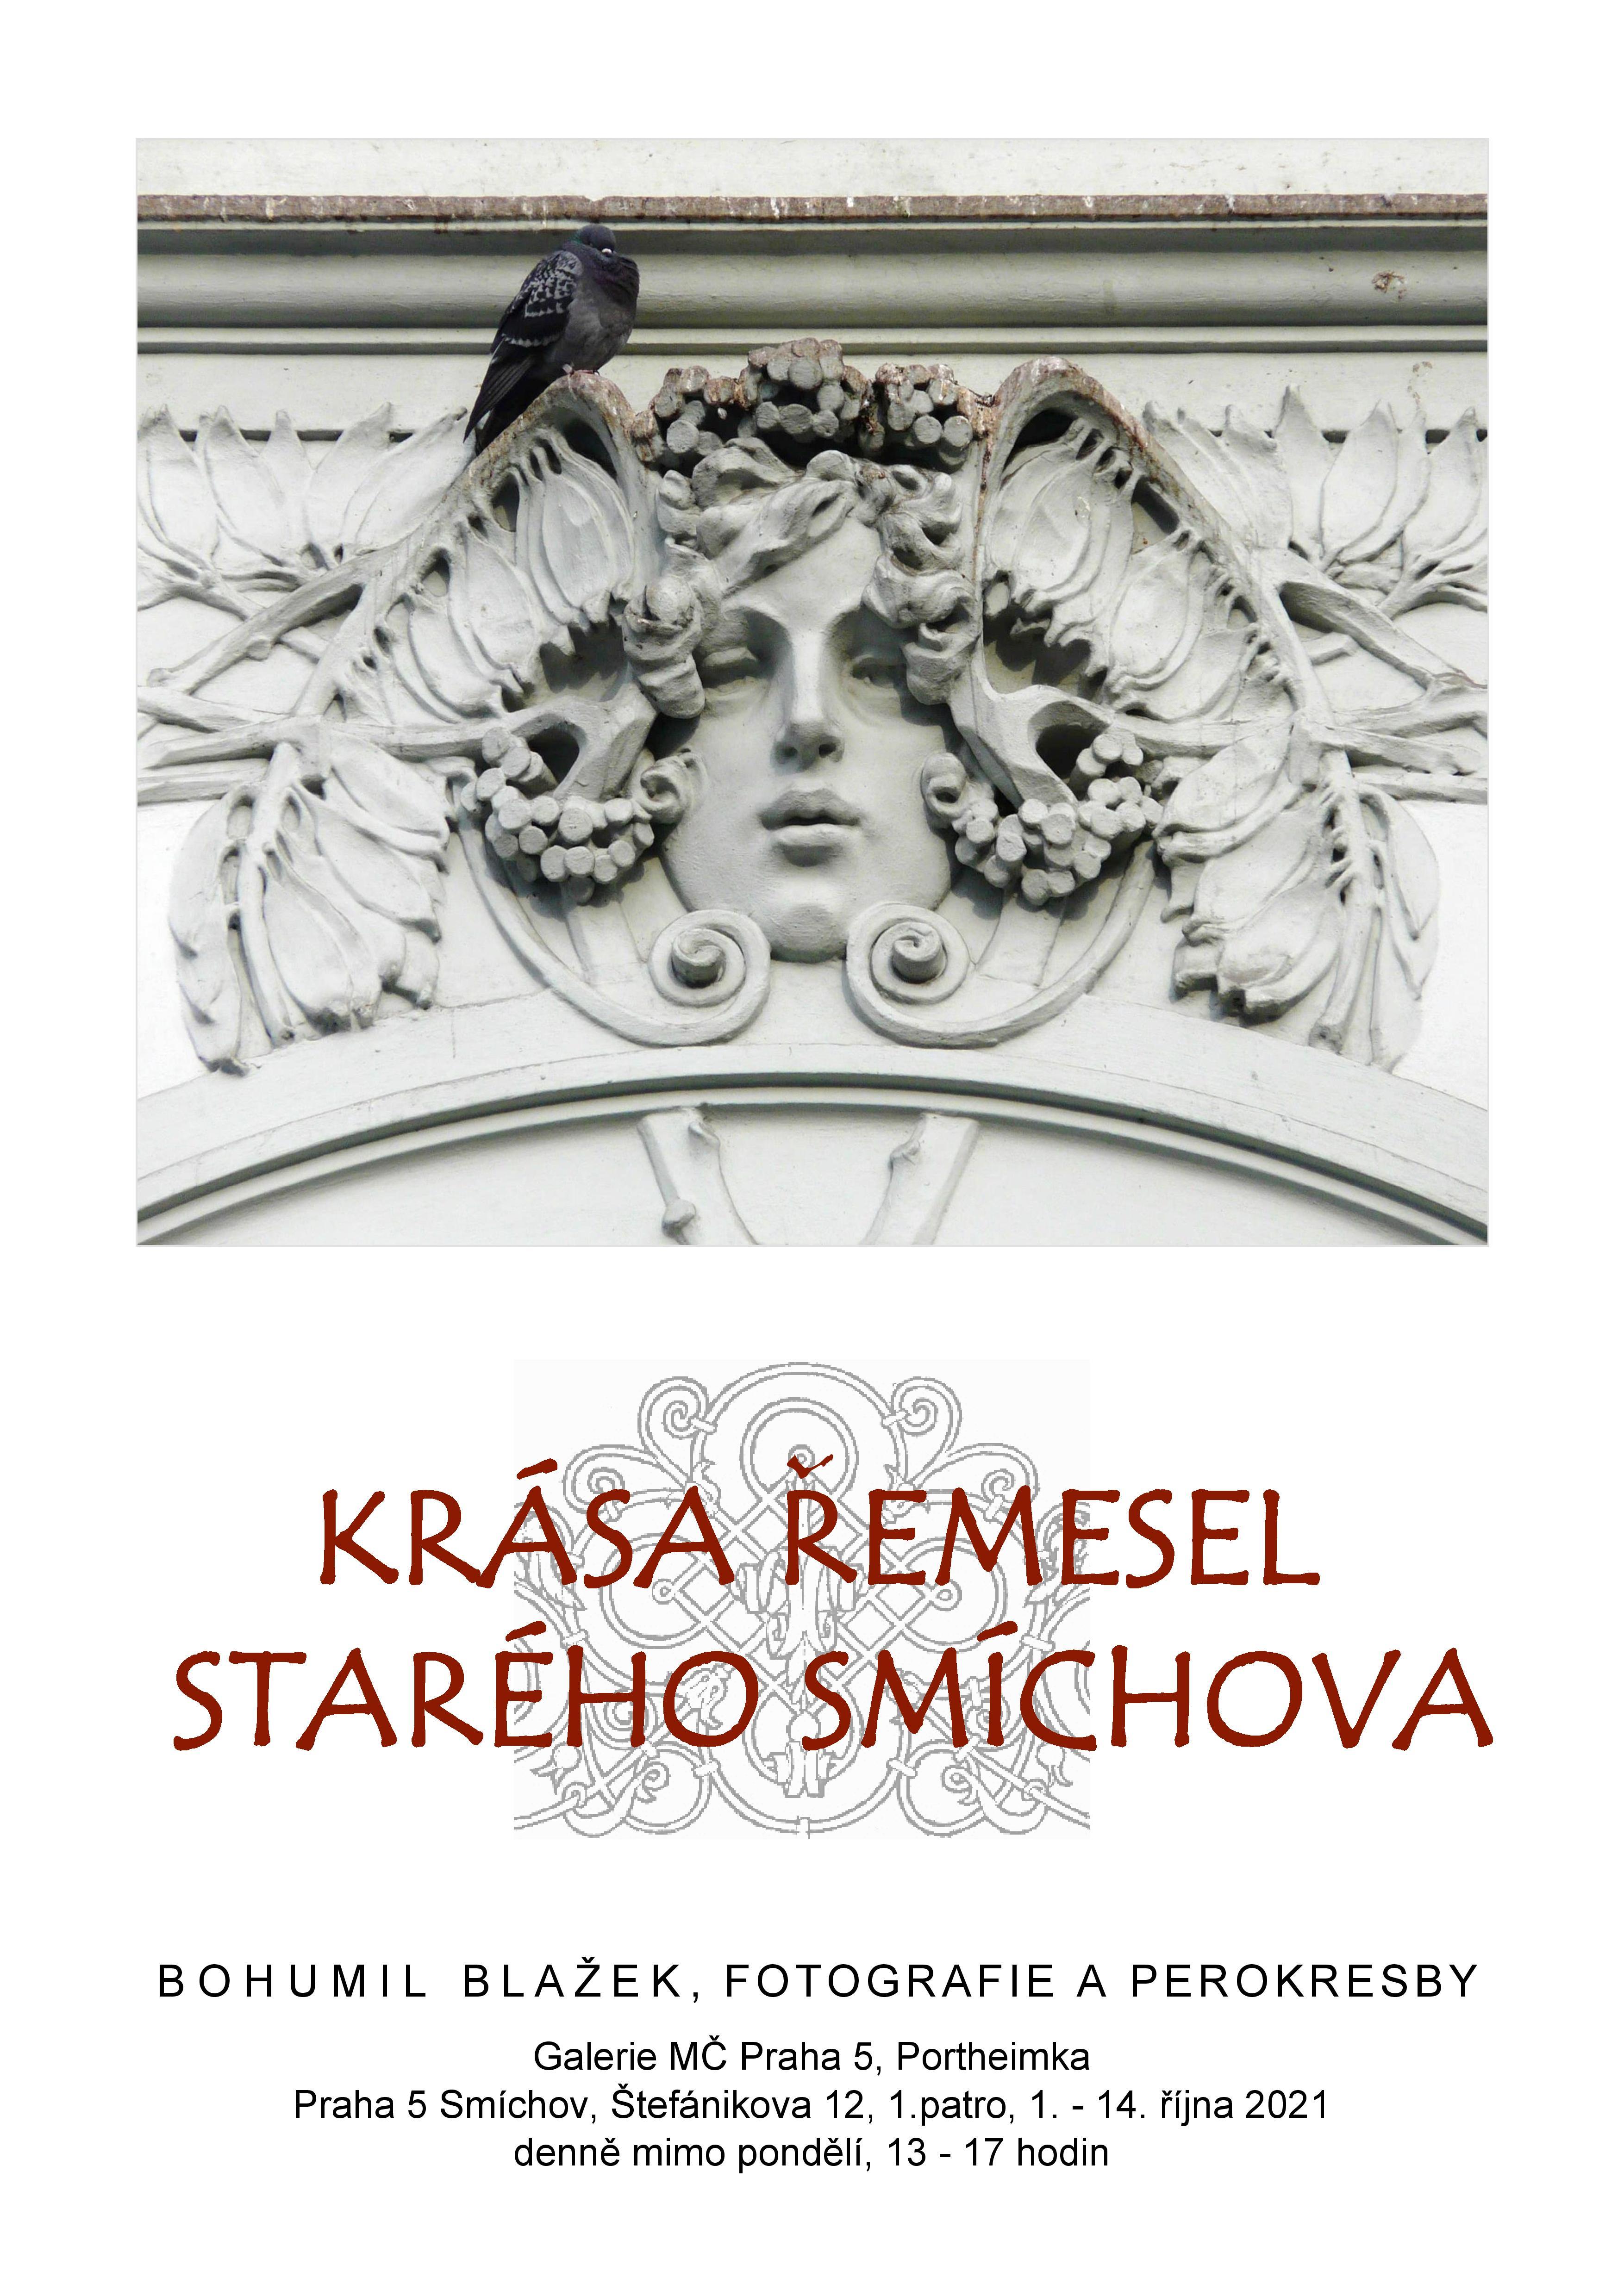 odlozena-vystava-krasa-remesel-stareho-smichova-od-1-rijna-2021-v-portheimce